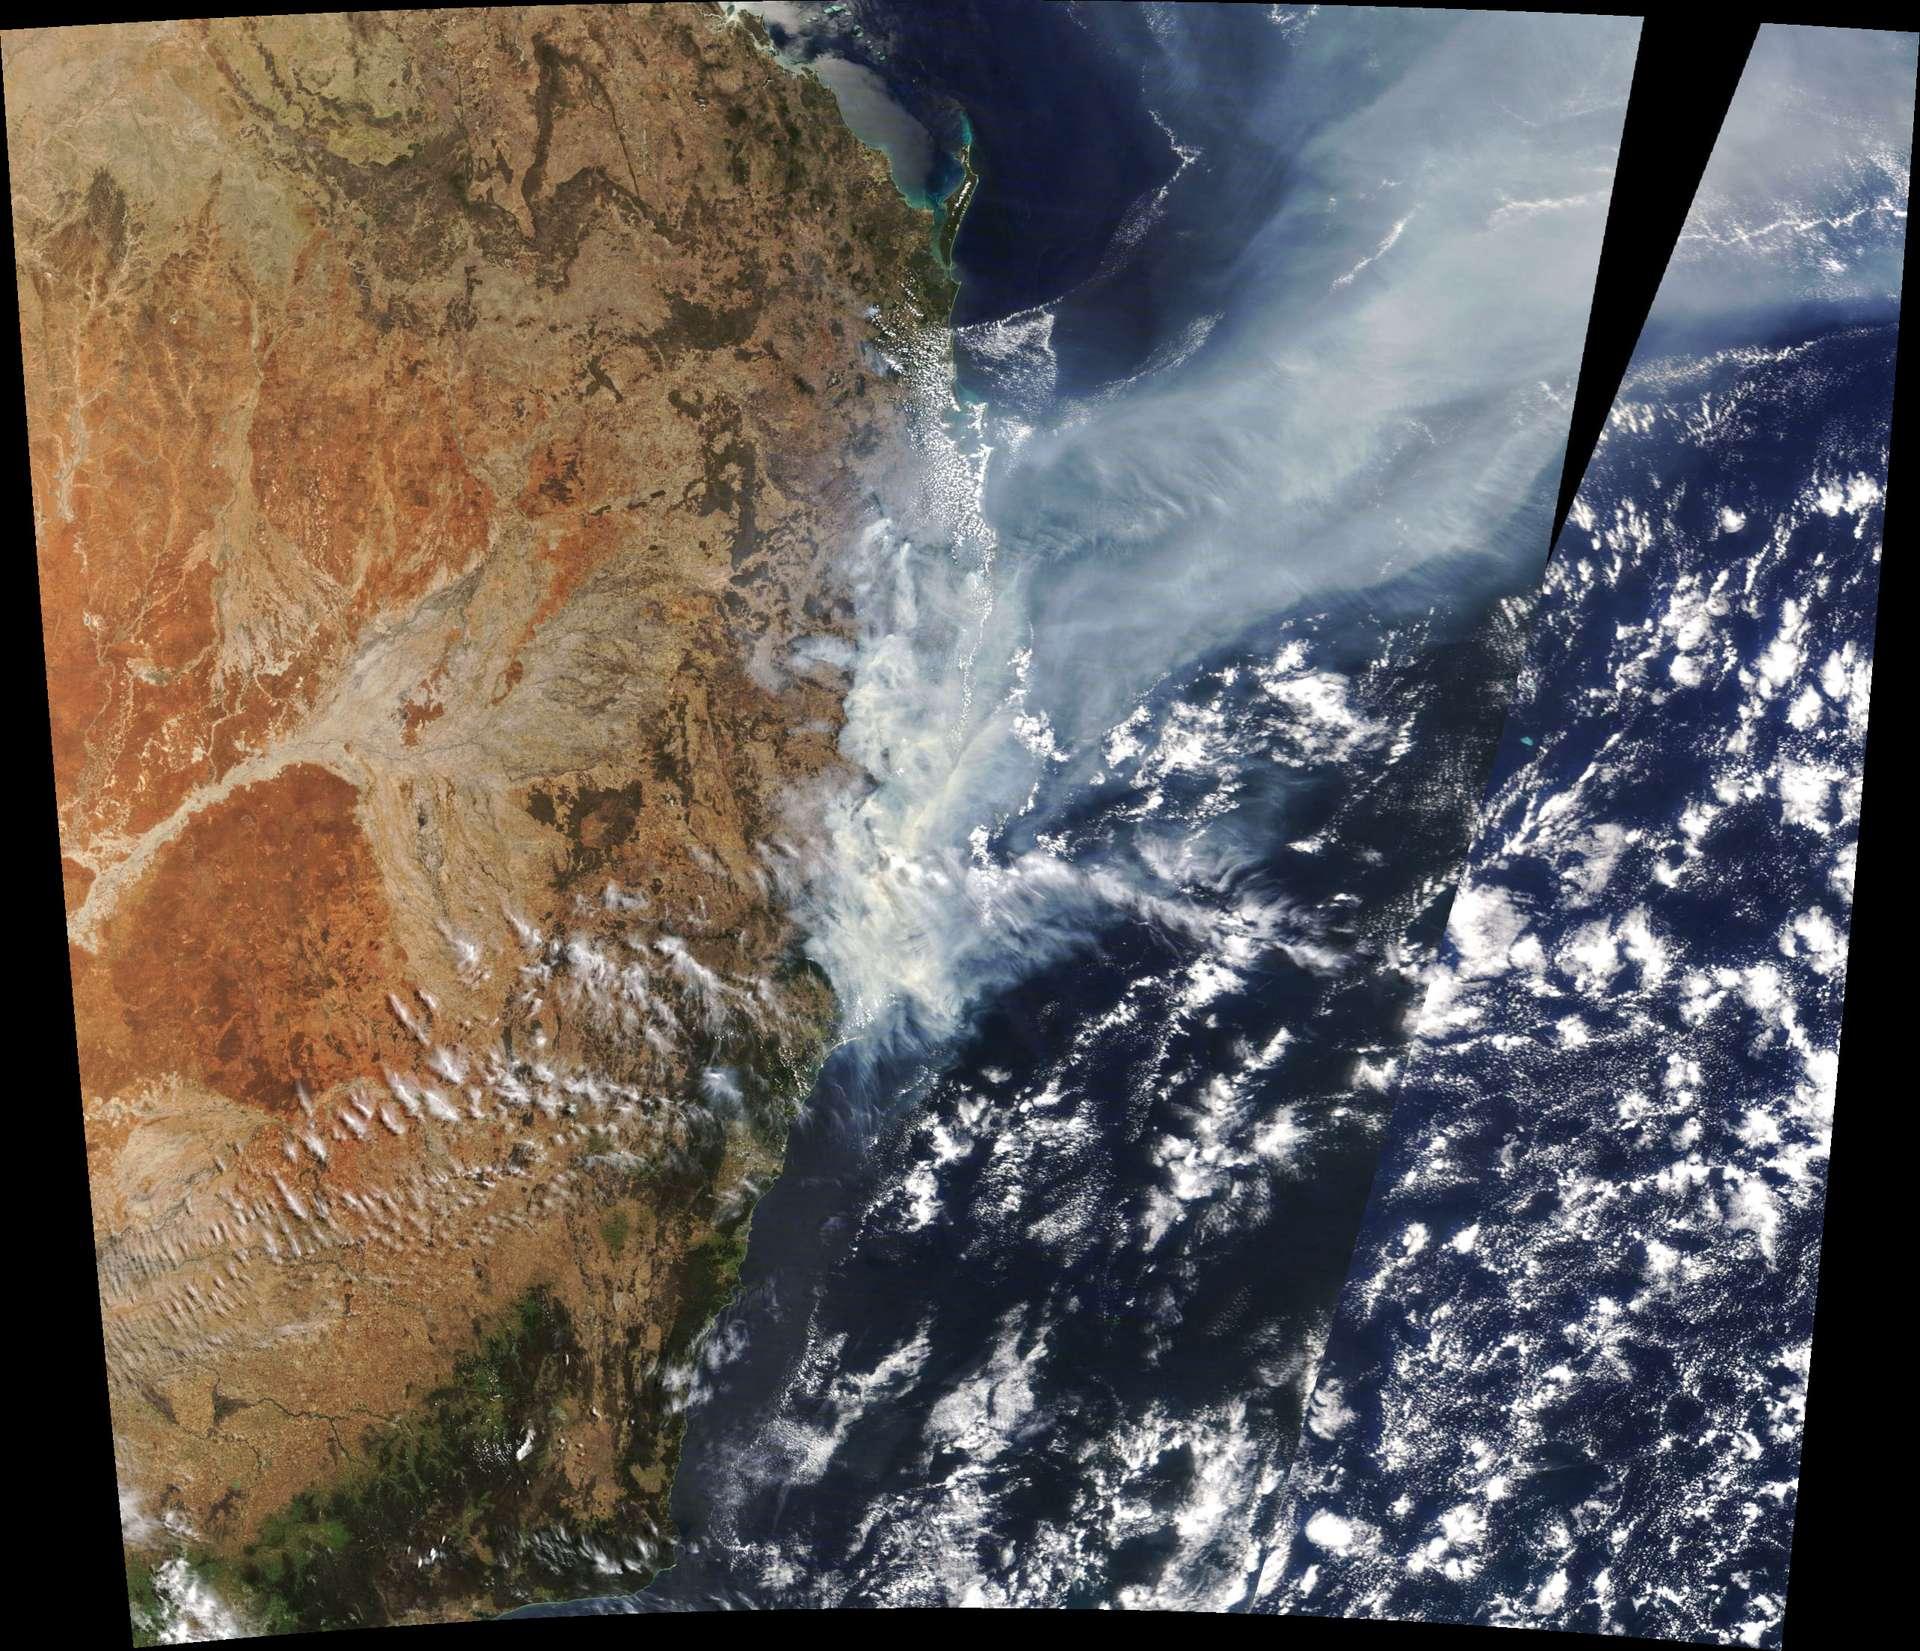 Incendies en Australie vus de l'espace, le 11 novembre 2019. © Nasa Earth Observatory